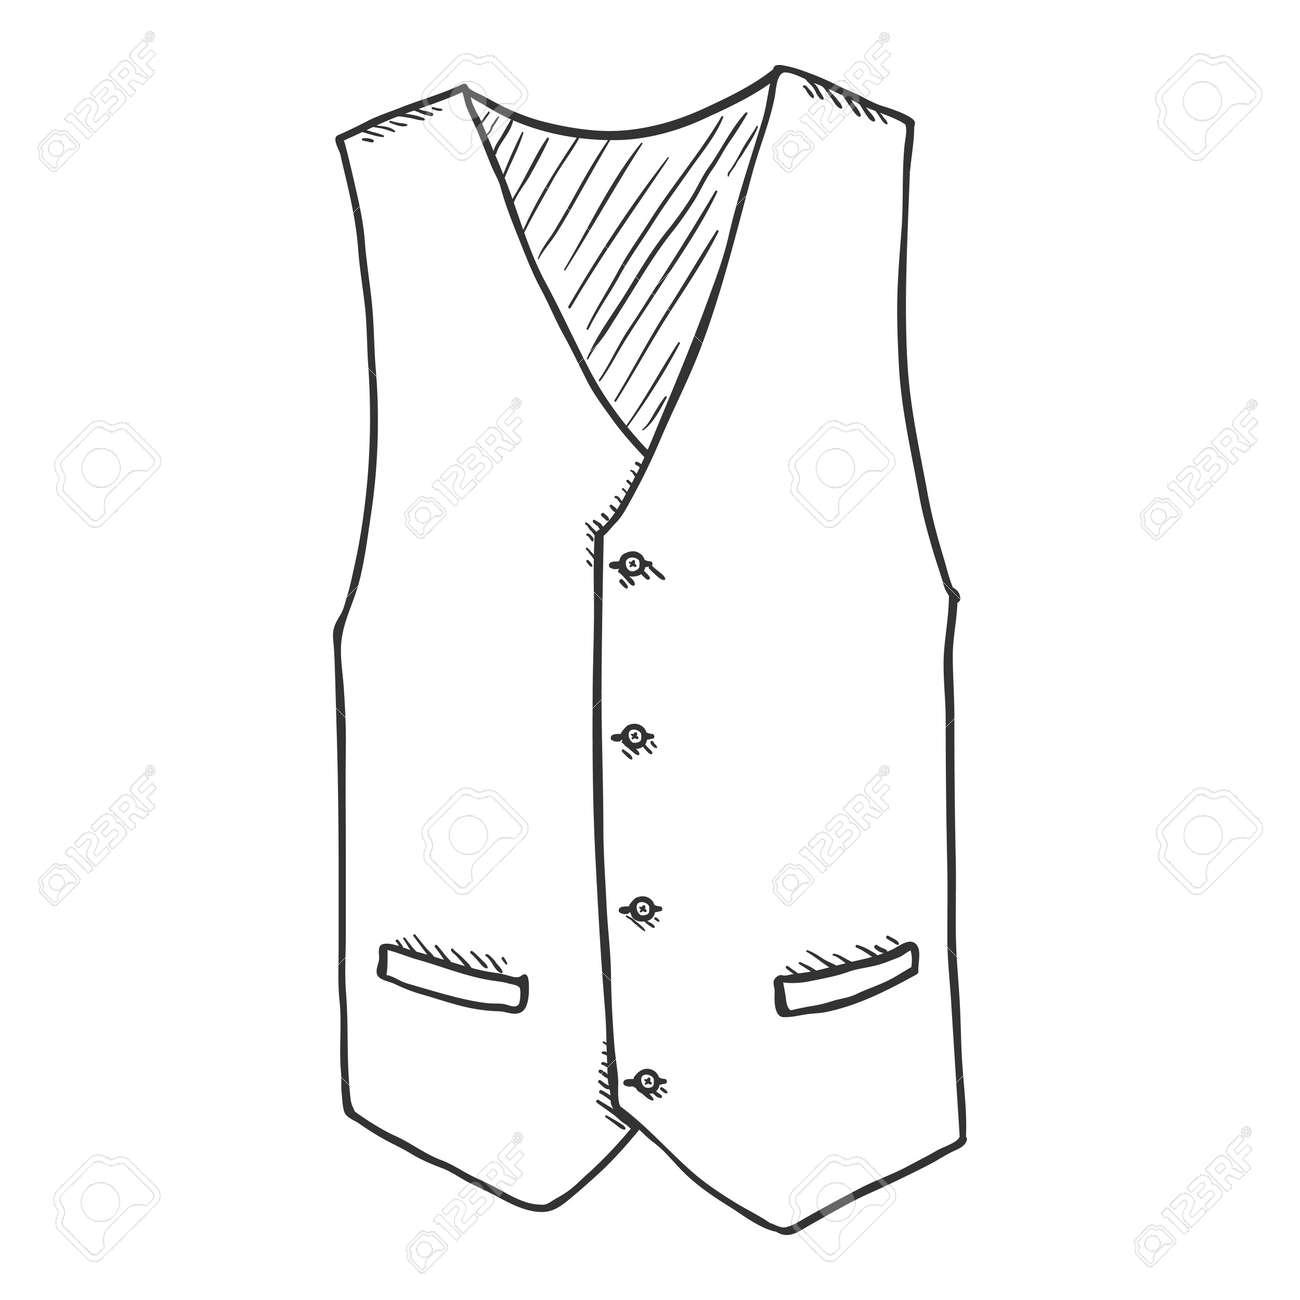 Sketch Waiscoat. Vector Cartoon Illustration of Hand Drawn Vest - 169663662